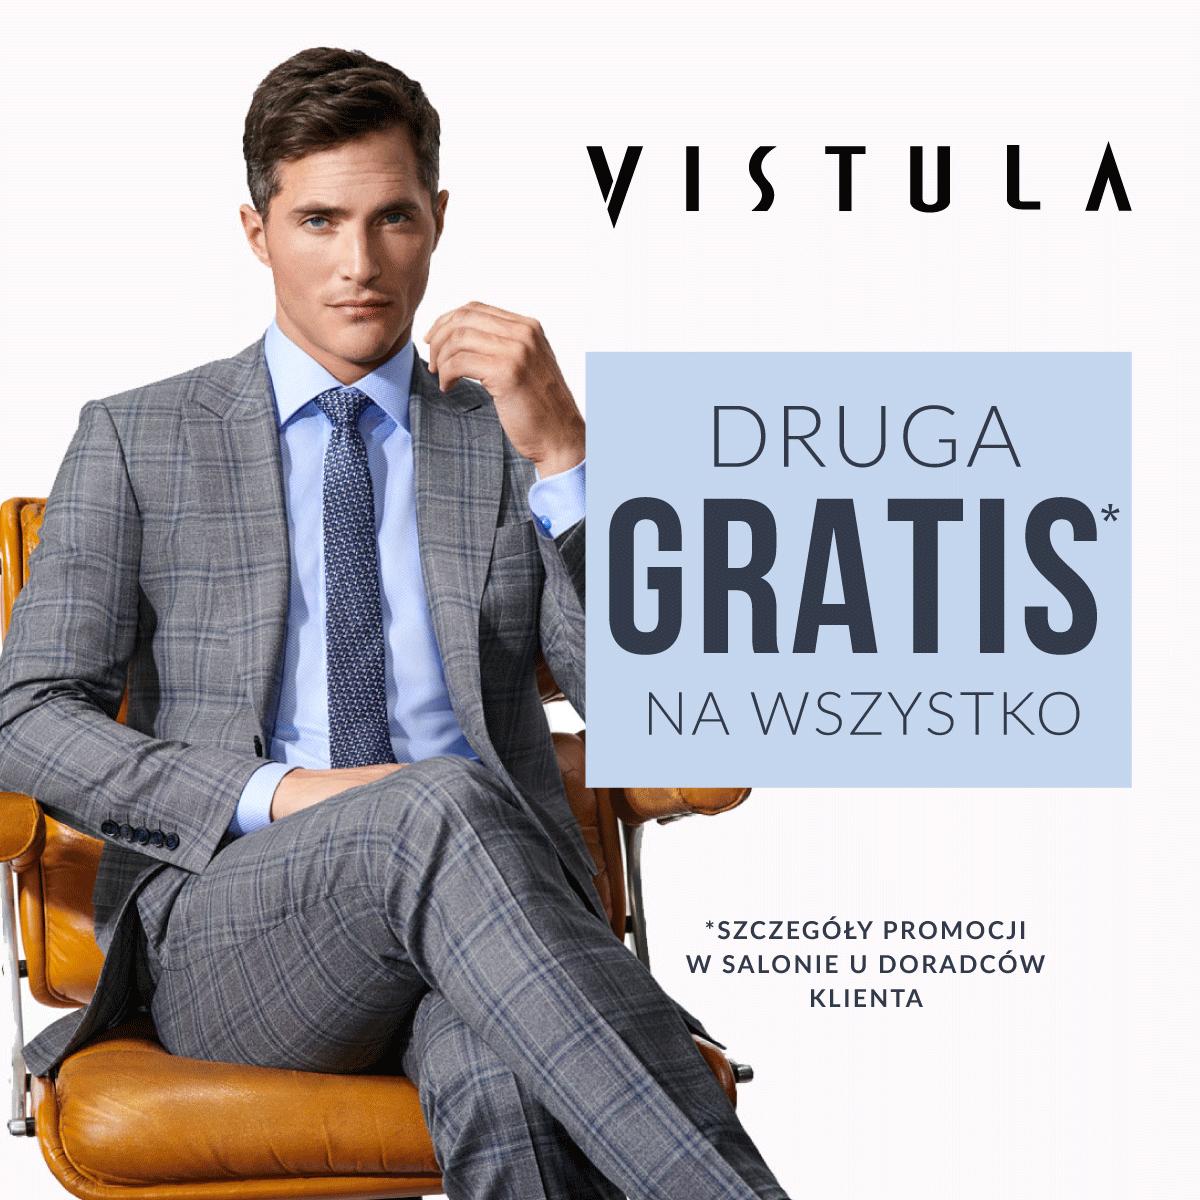 Druga sztuka gratis w salonie Vistula!